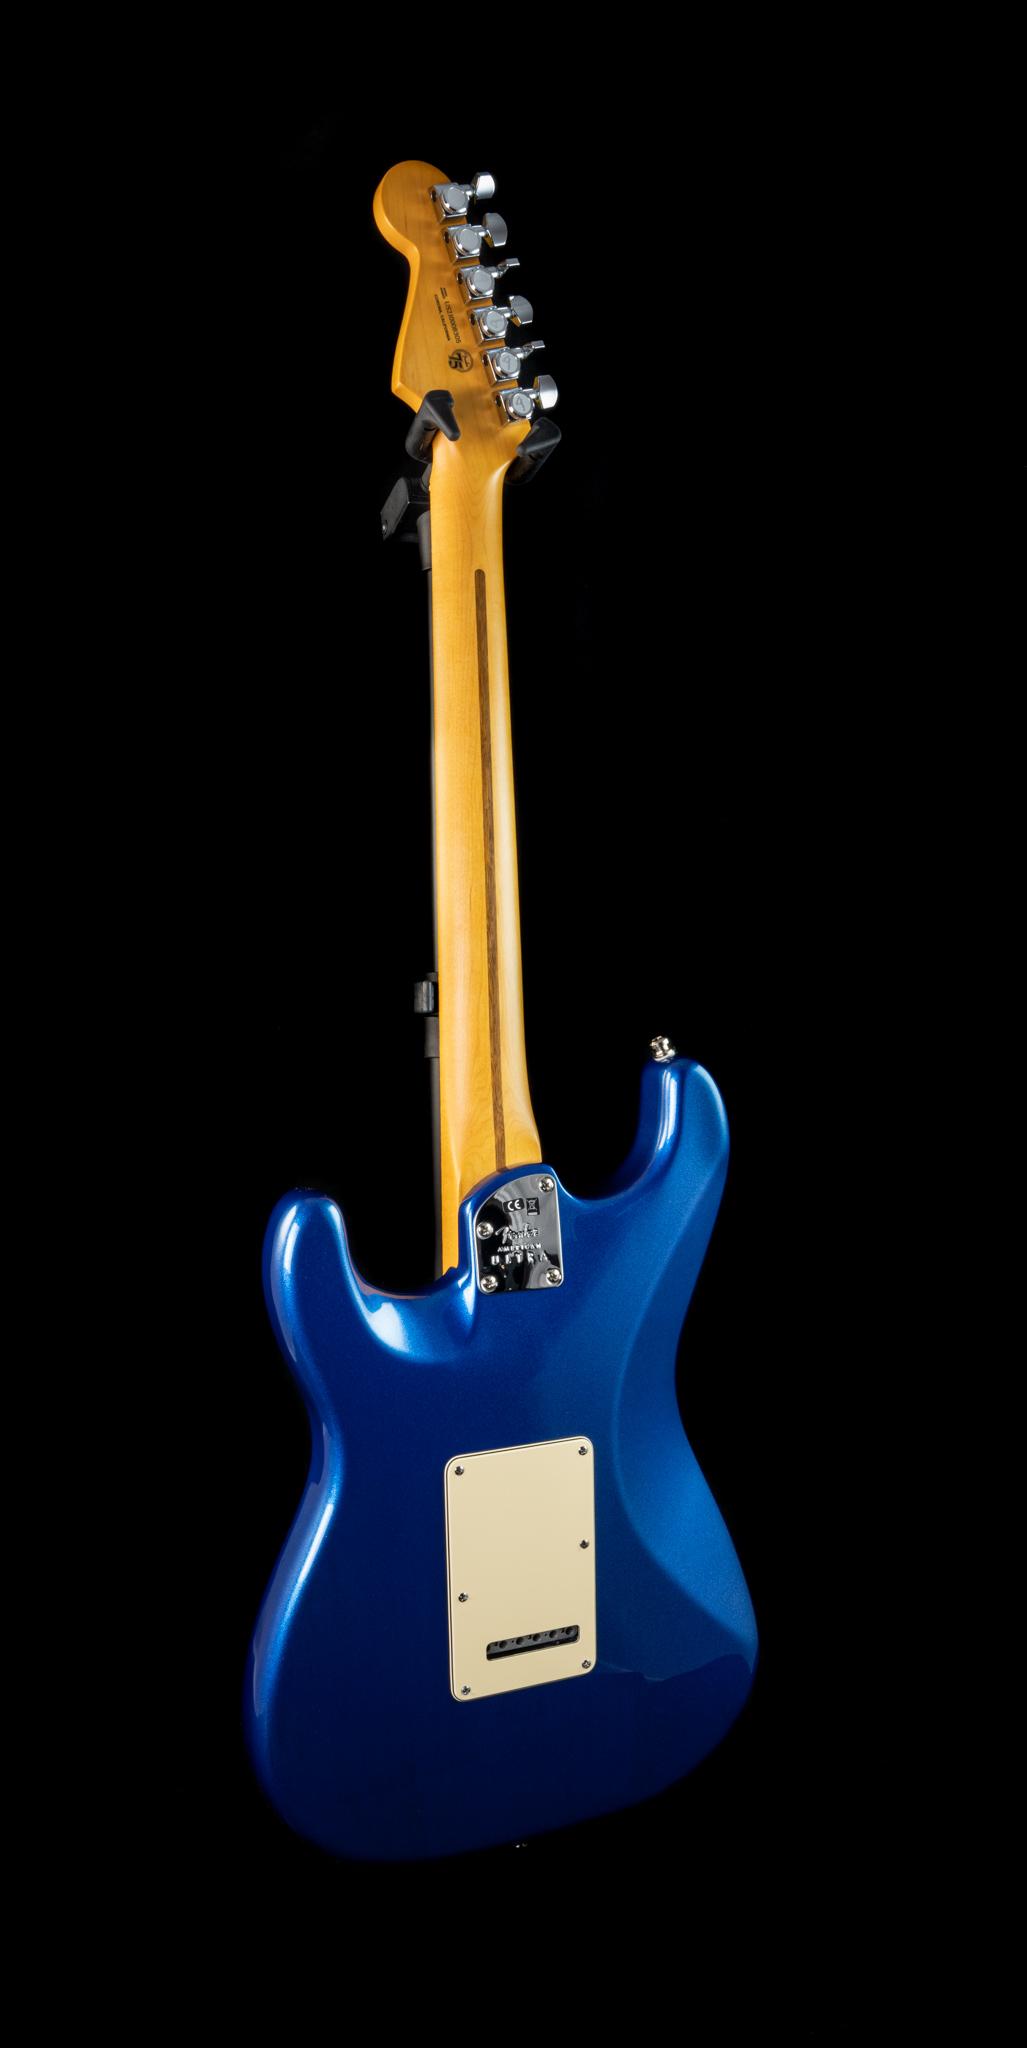 Fender American Ultra Stratocaster in Cobra Blue, Pre-Owned